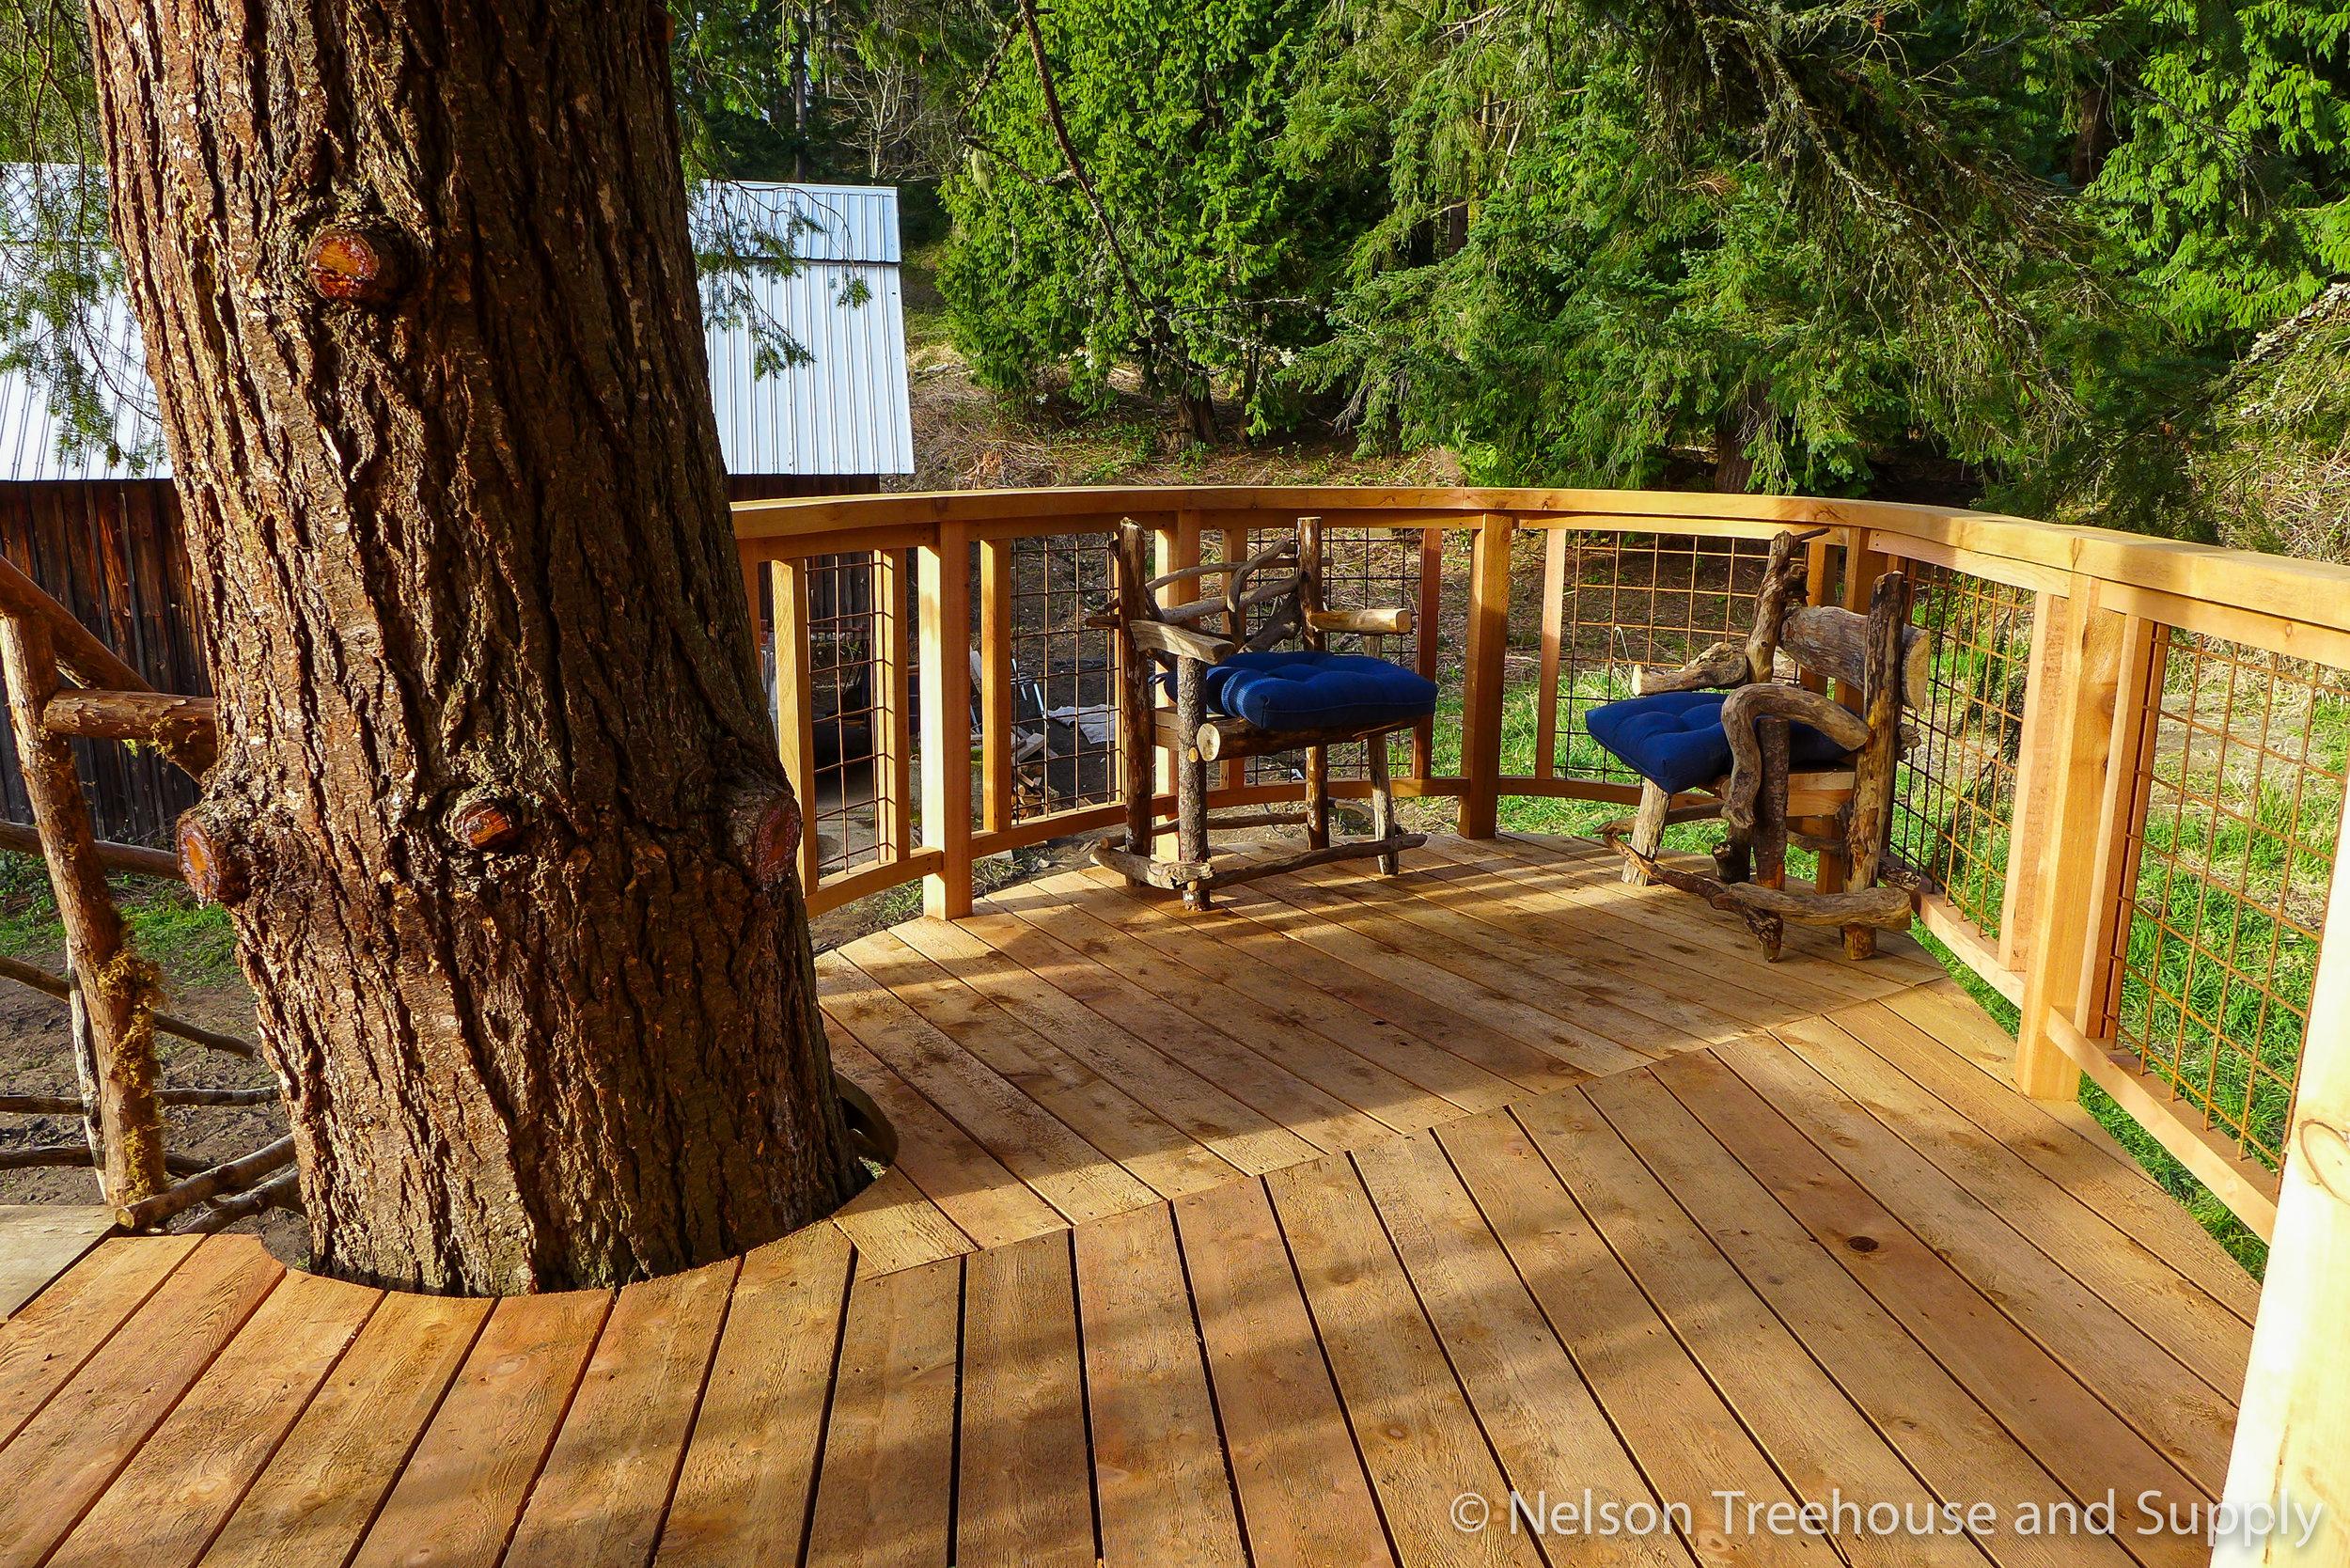 charlies_treehouse_deck